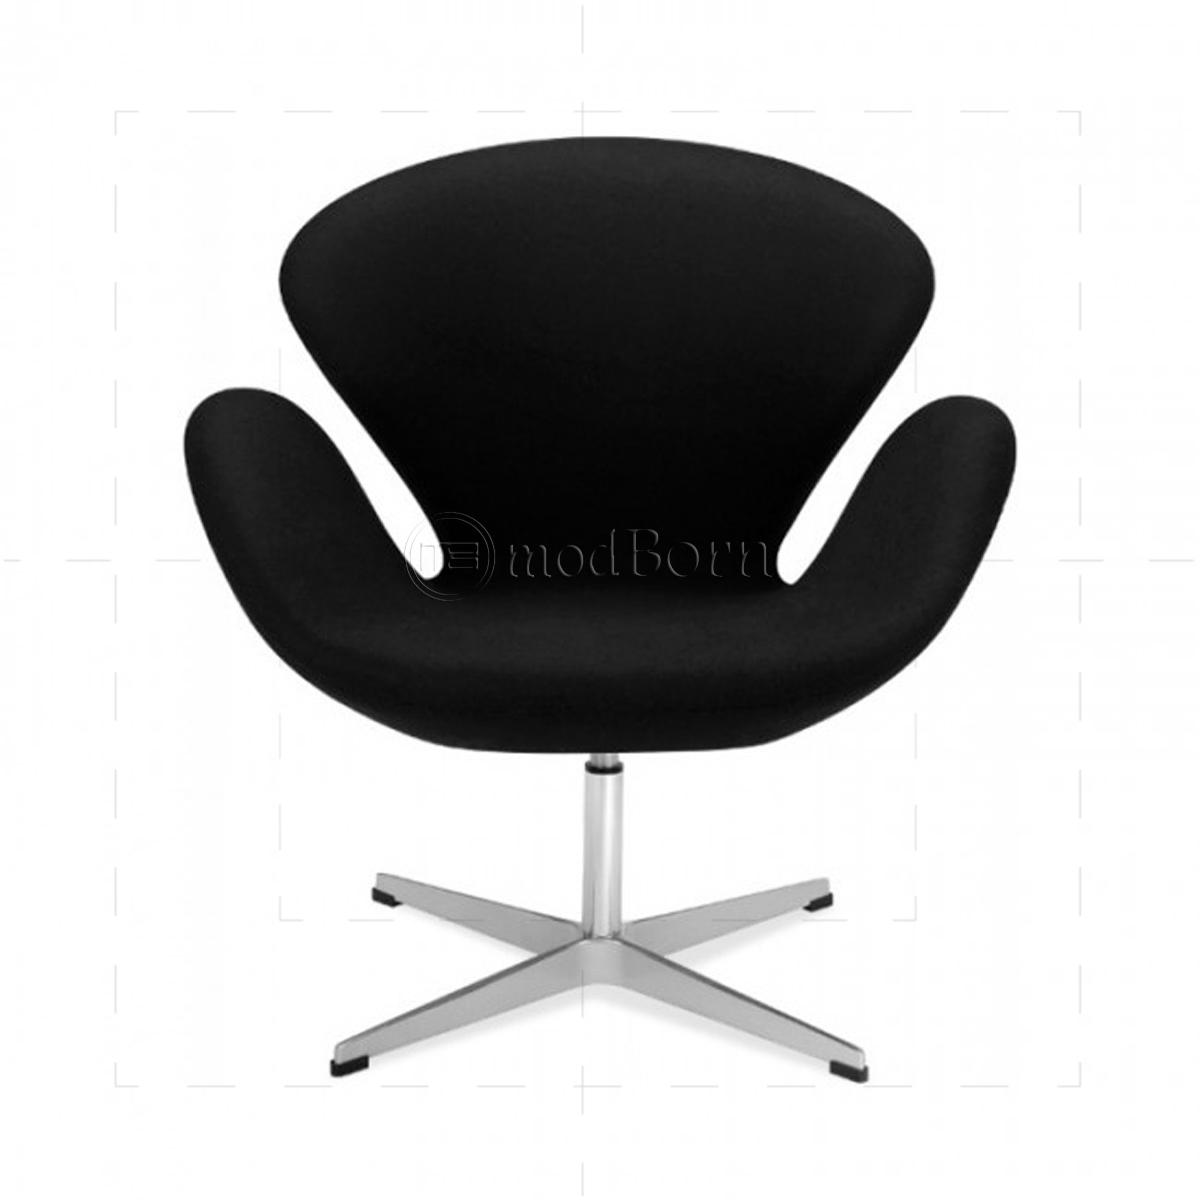 arne jacobsen style swan chair black. Black Bedroom Furniture Sets. Home Design Ideas